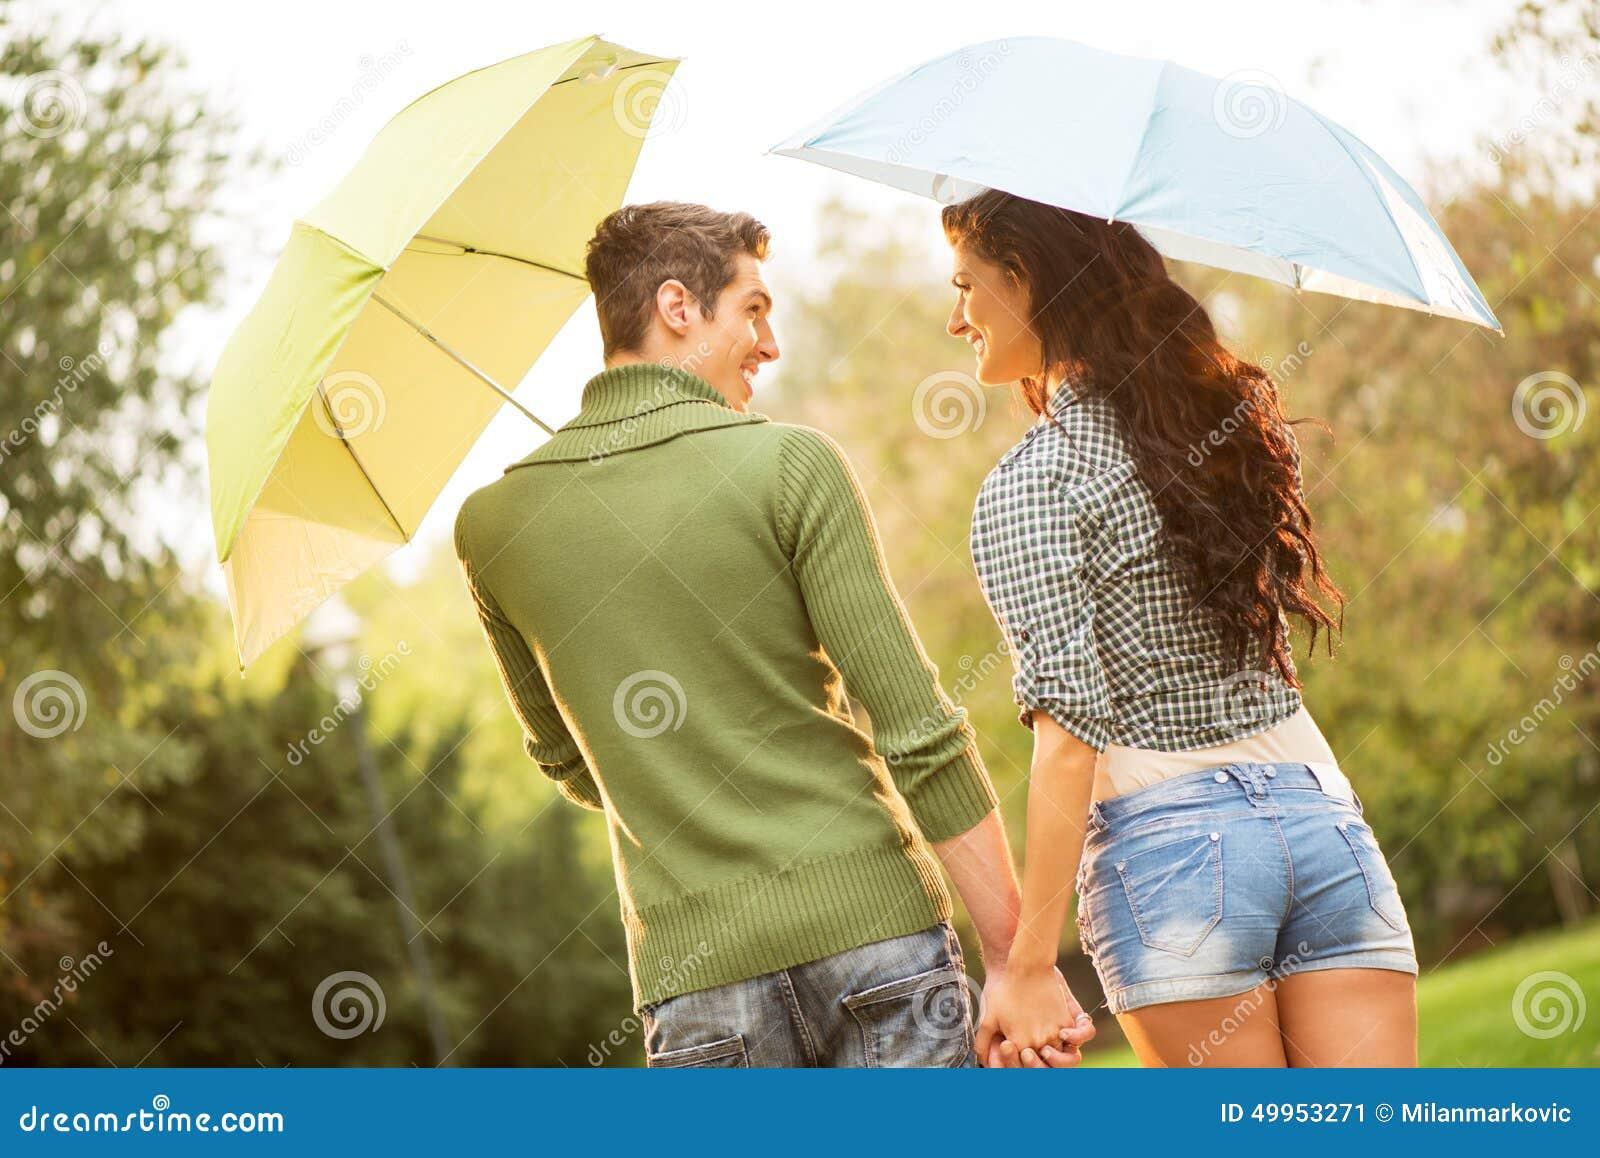 hook up dating sites